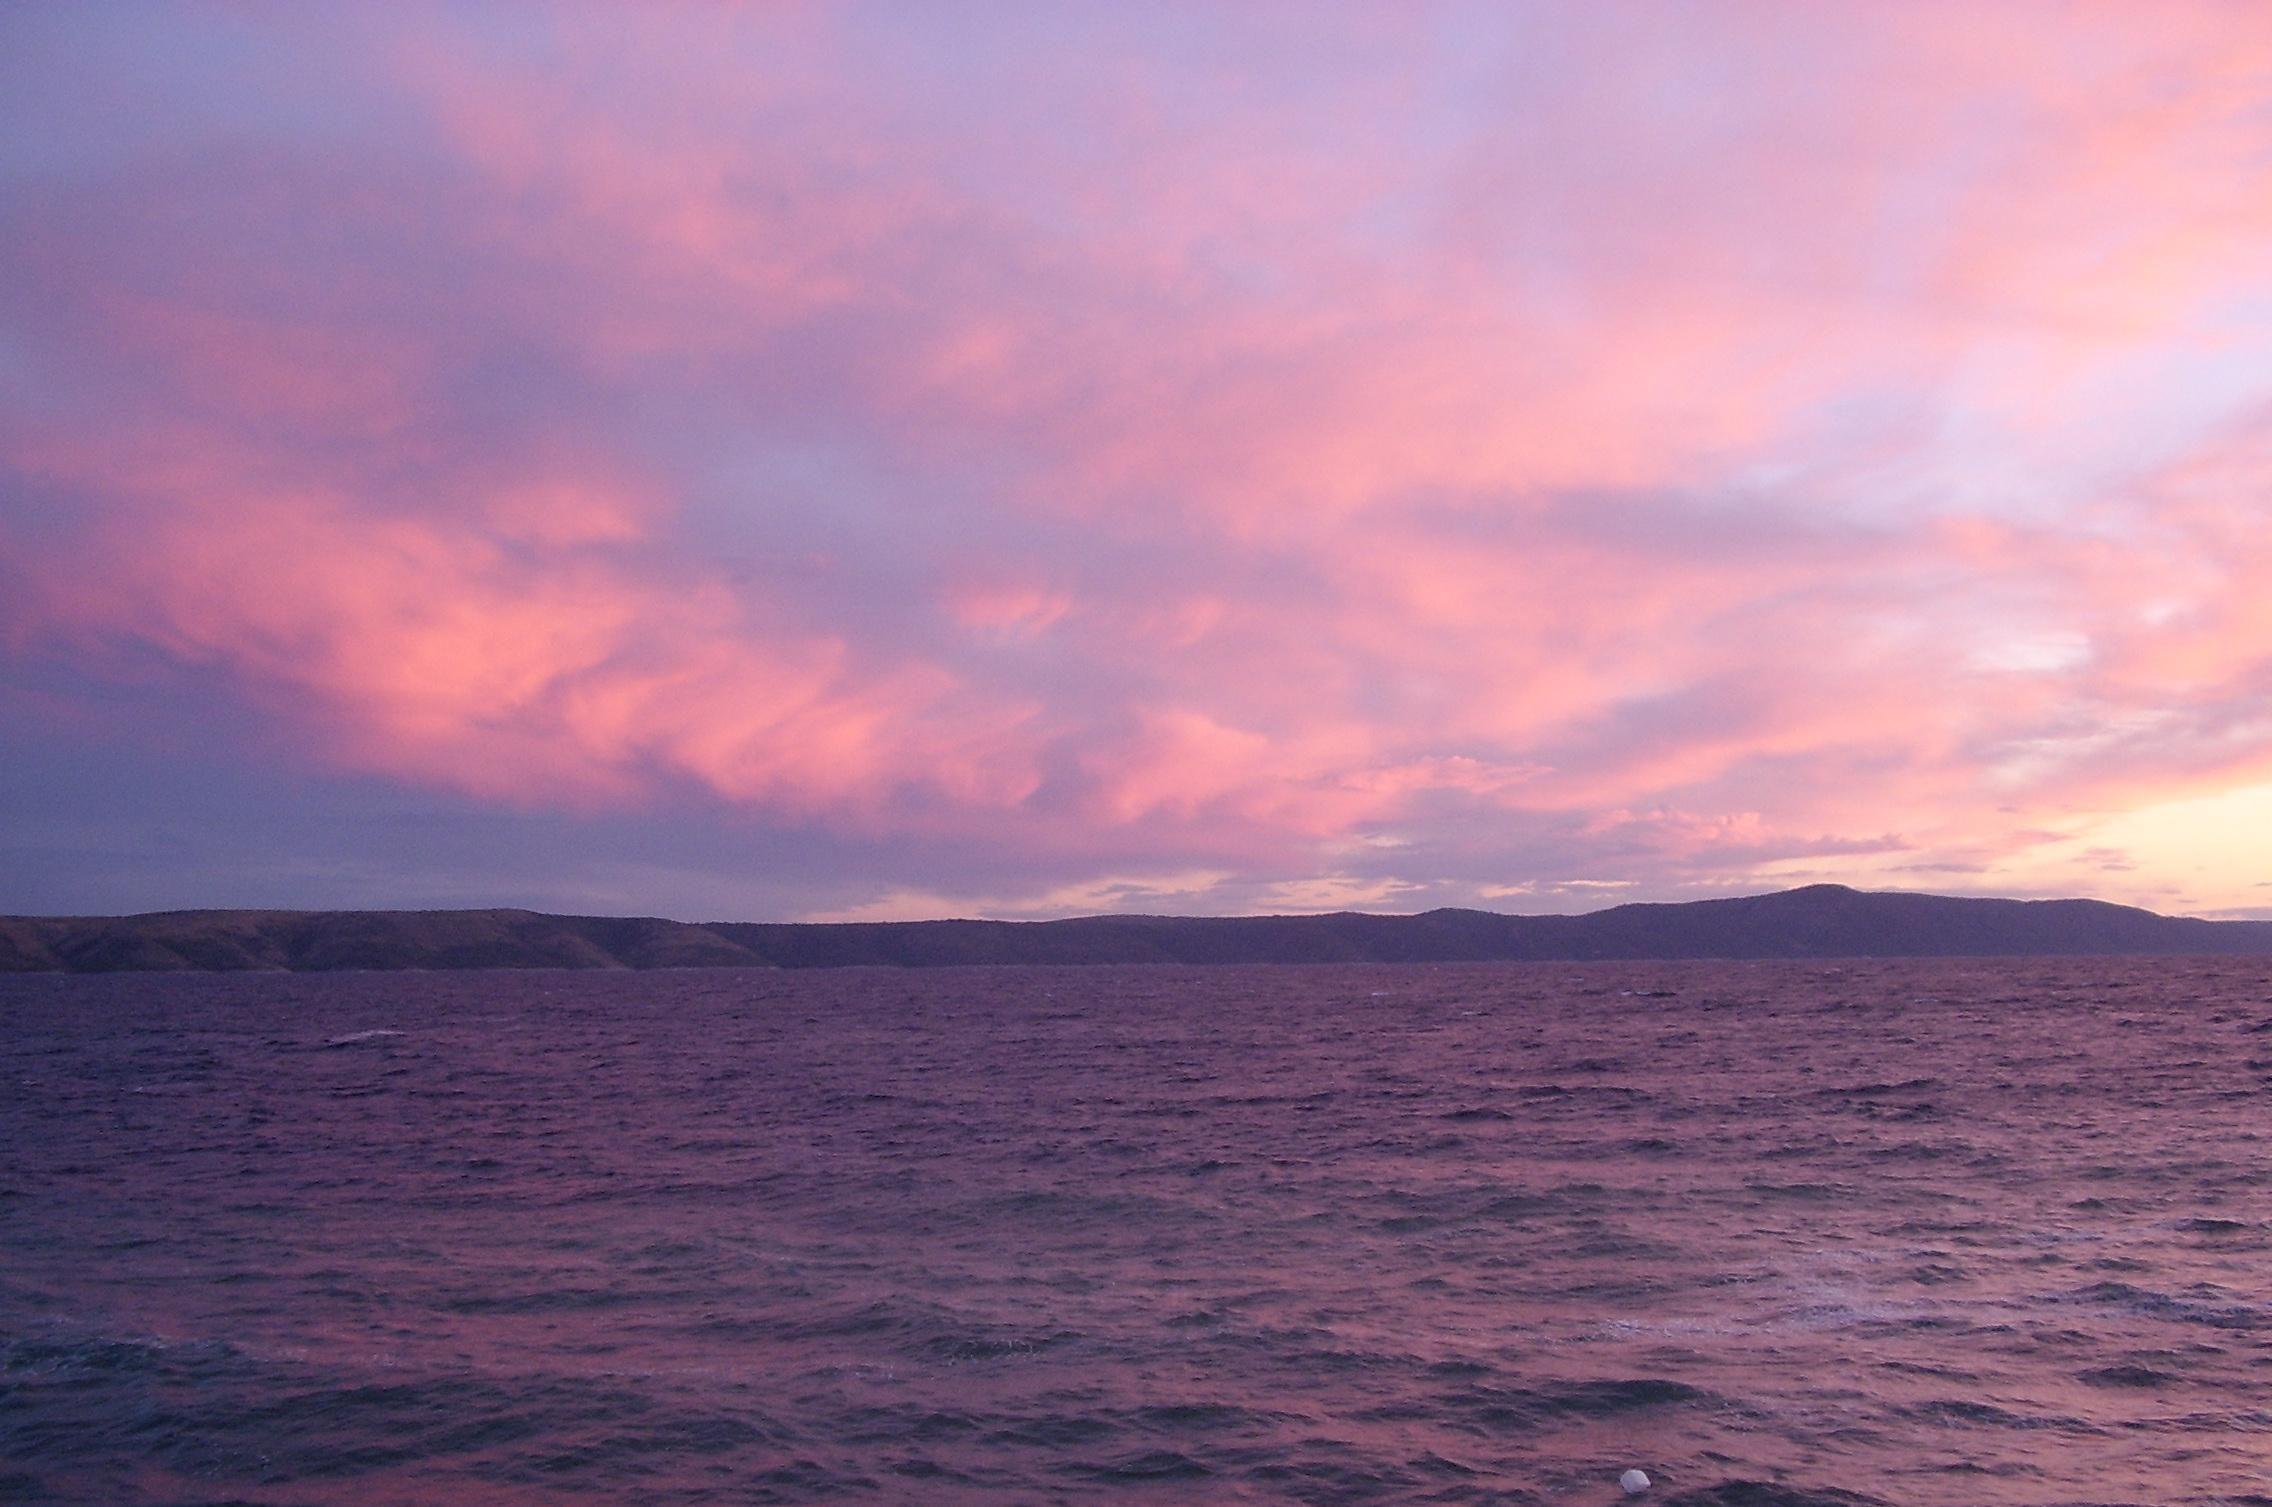 Aesthetic Purple Sunset Wallpaper Aesthetic Sunset Grey And Pink Sunset 2272x1507 Wallpaper Teahub Io